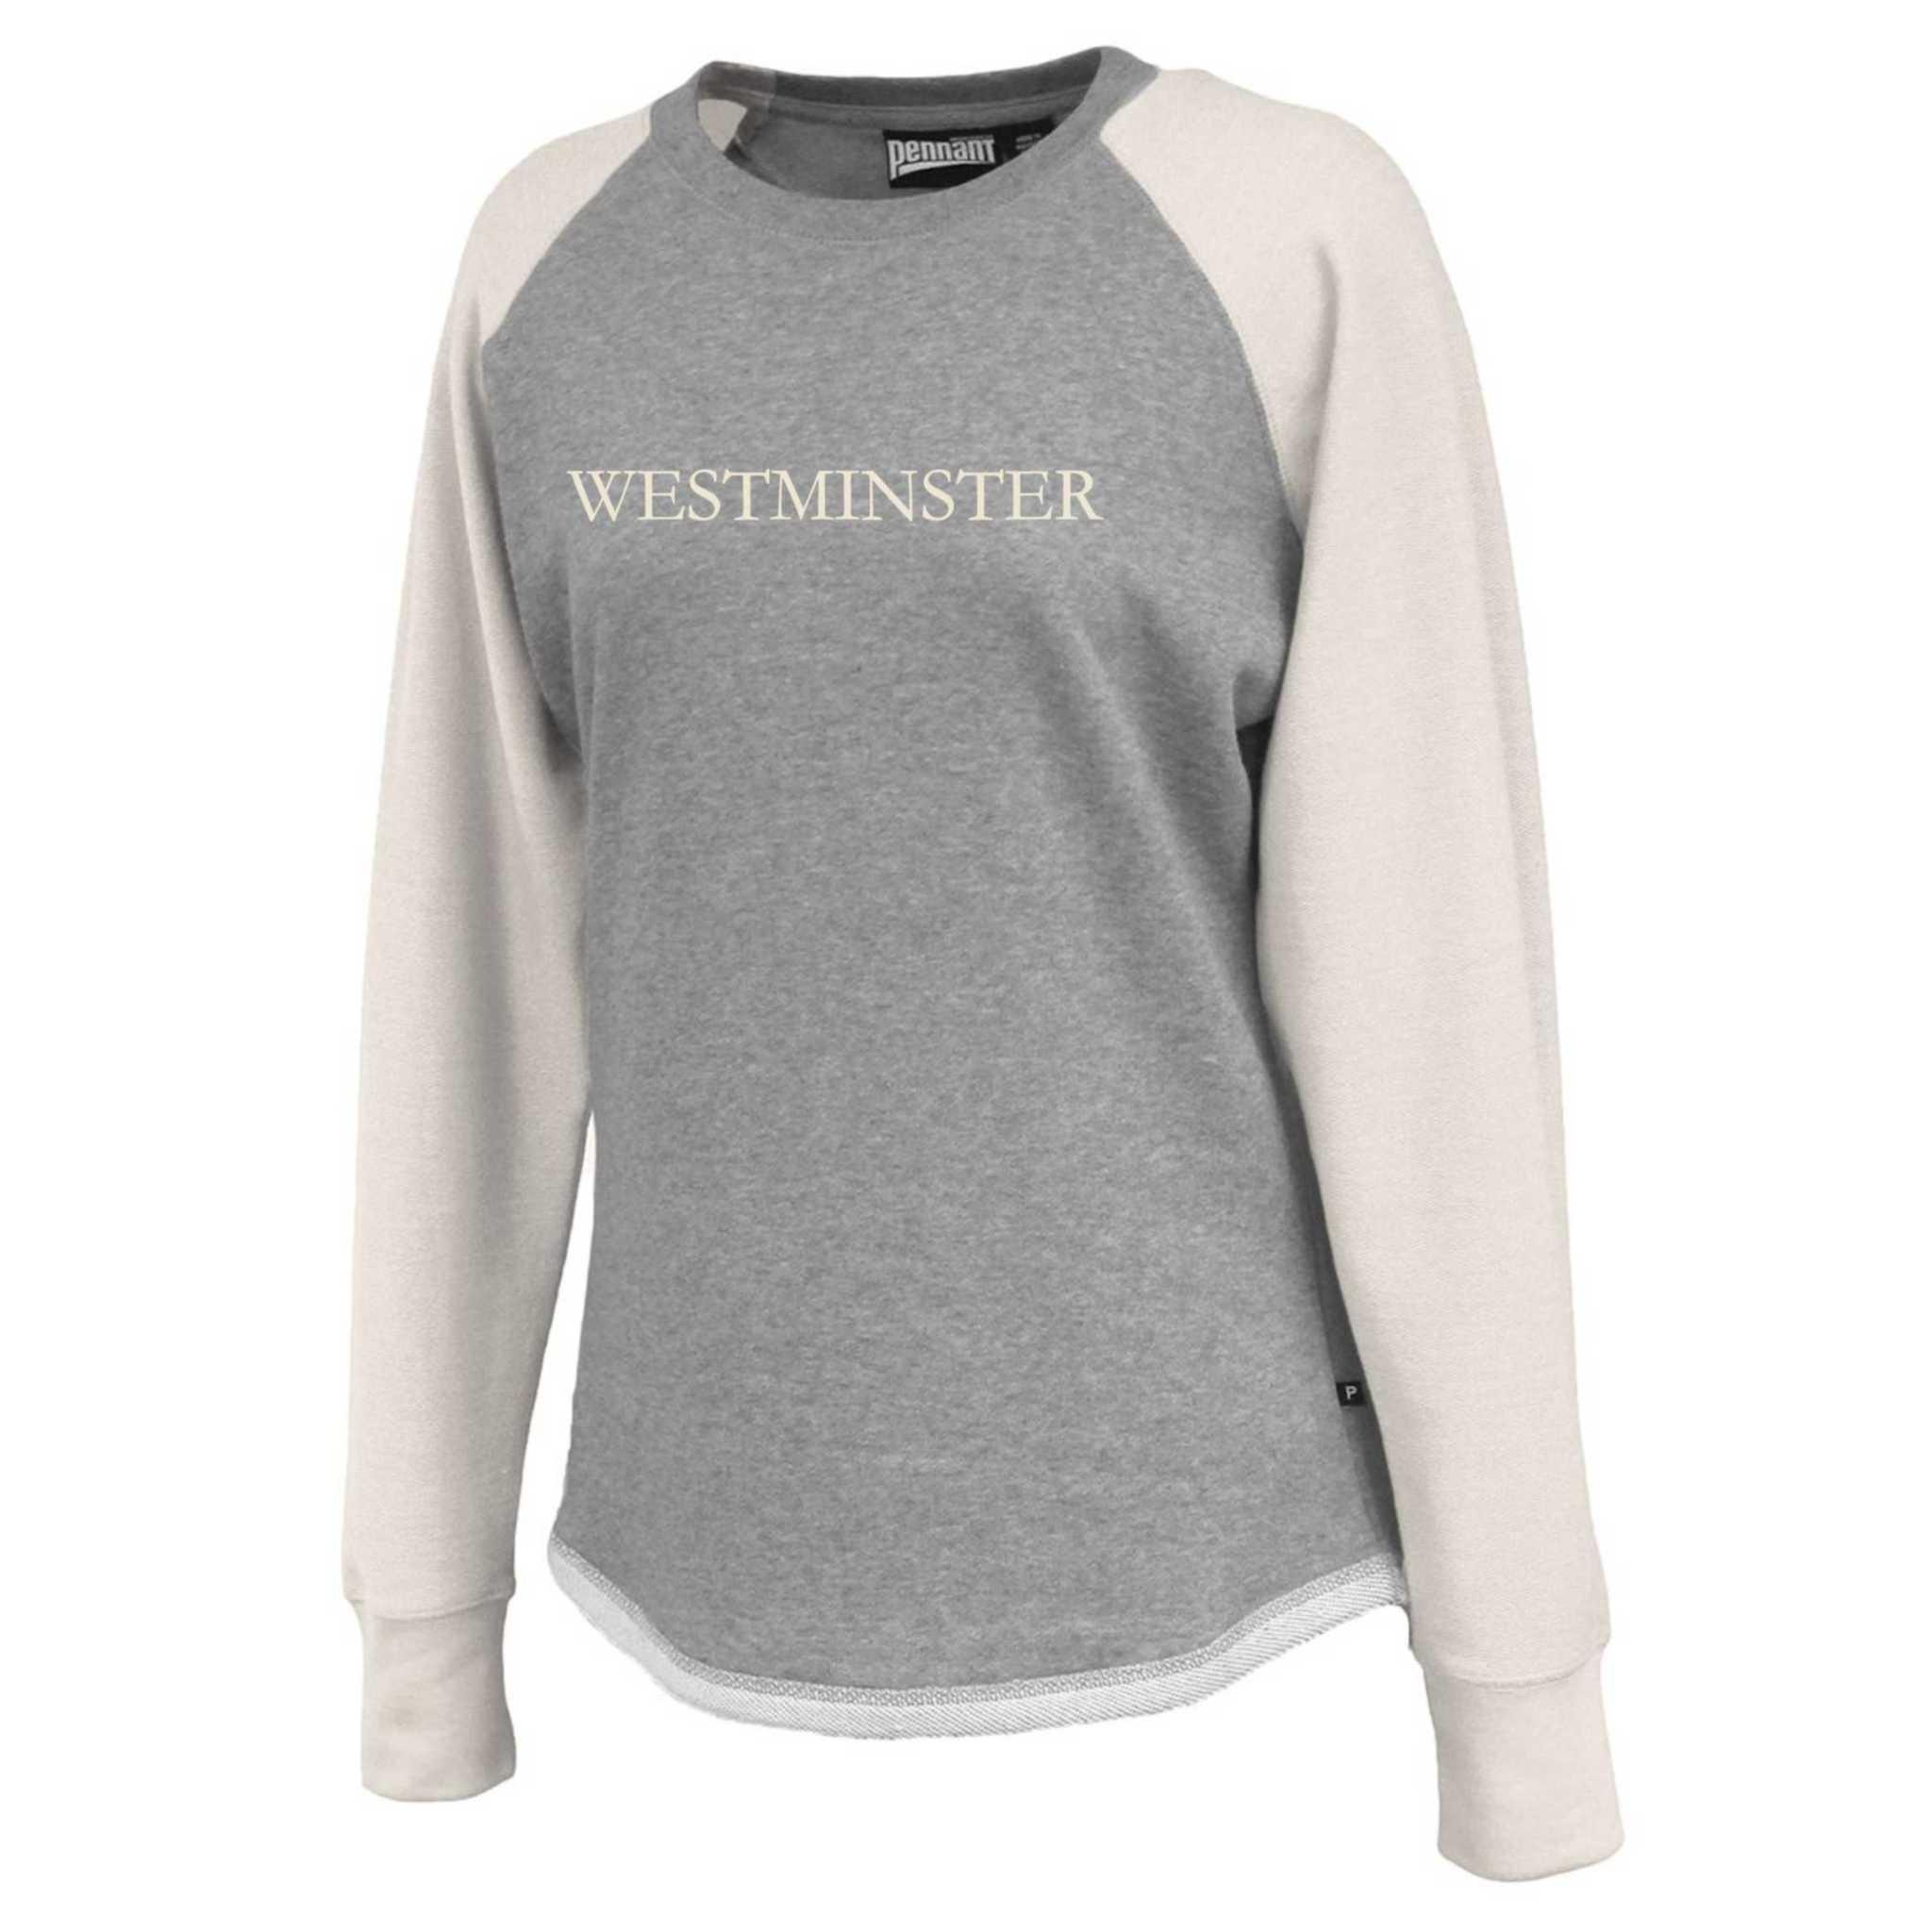 Forerunner-Pennant Sweatshirt: Forerunner Pennant Women's Crew